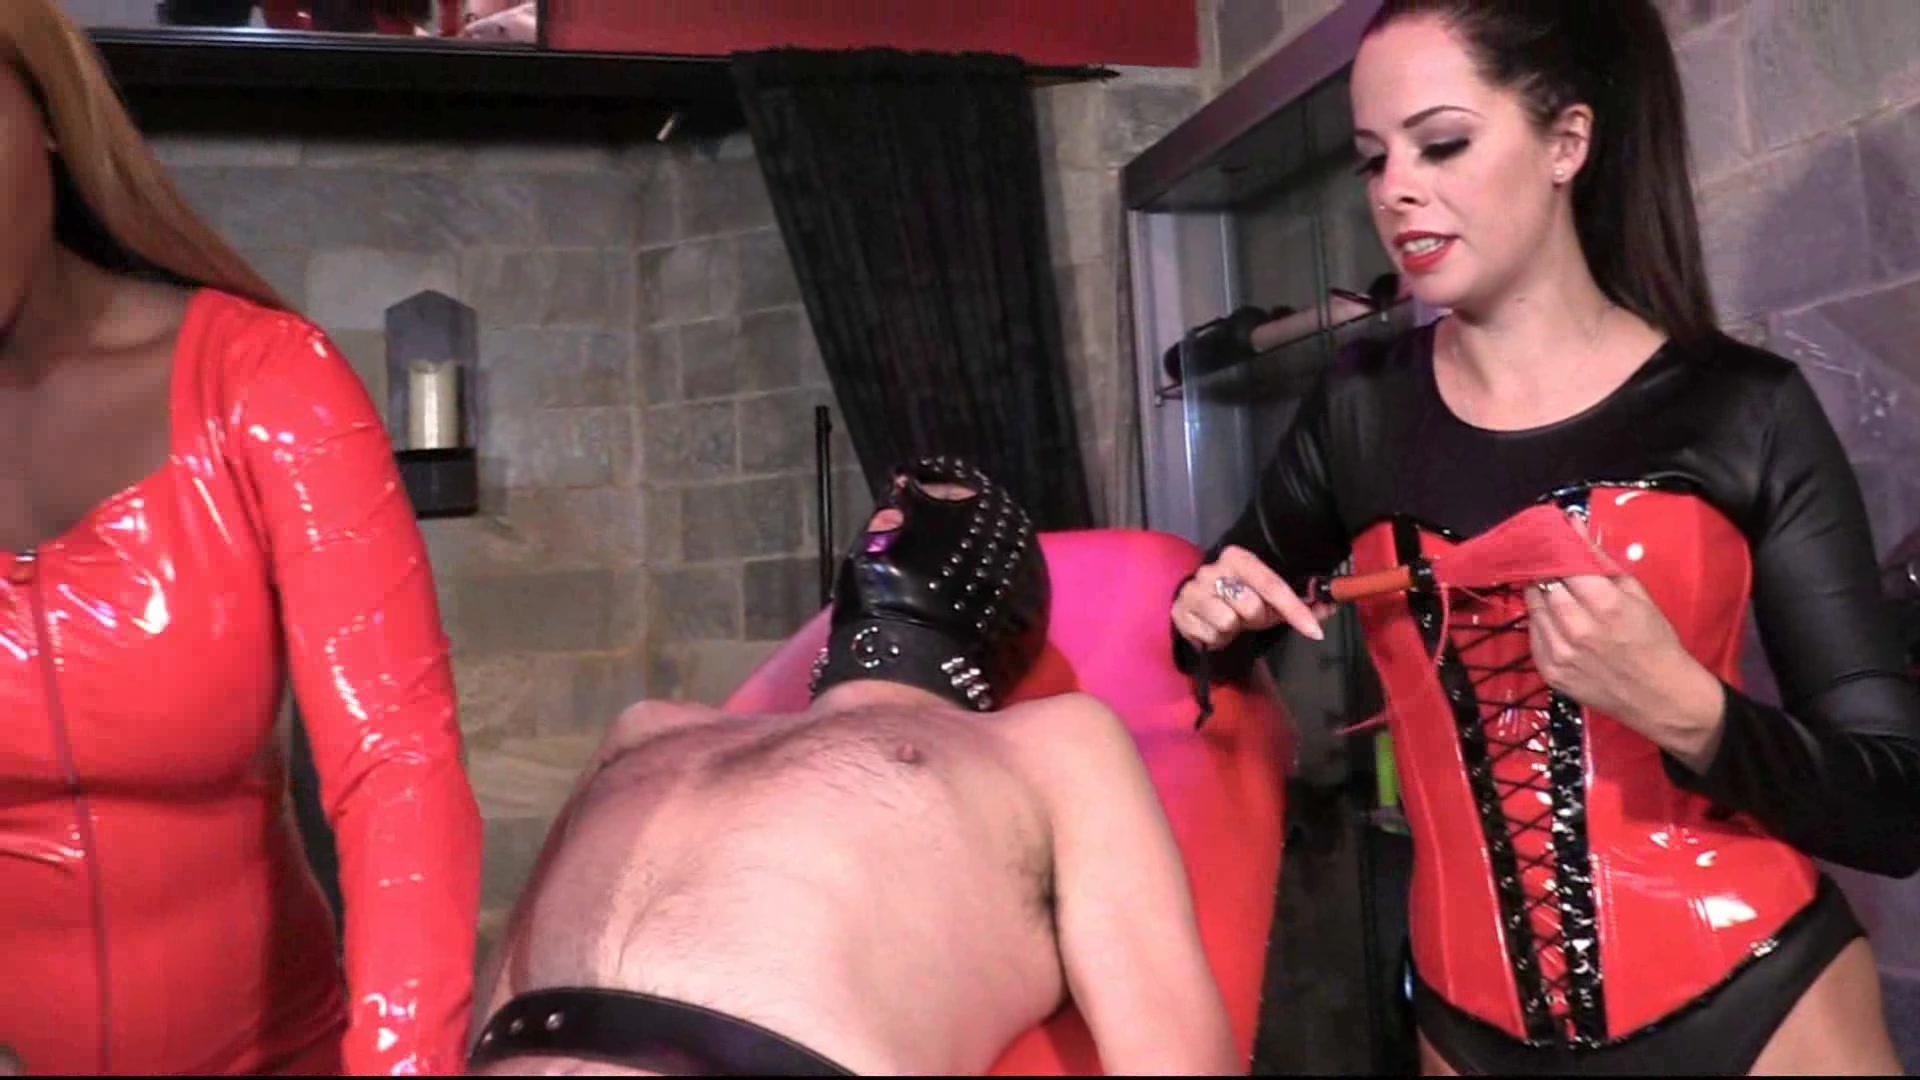 Real femdom castration wmv girl iran images